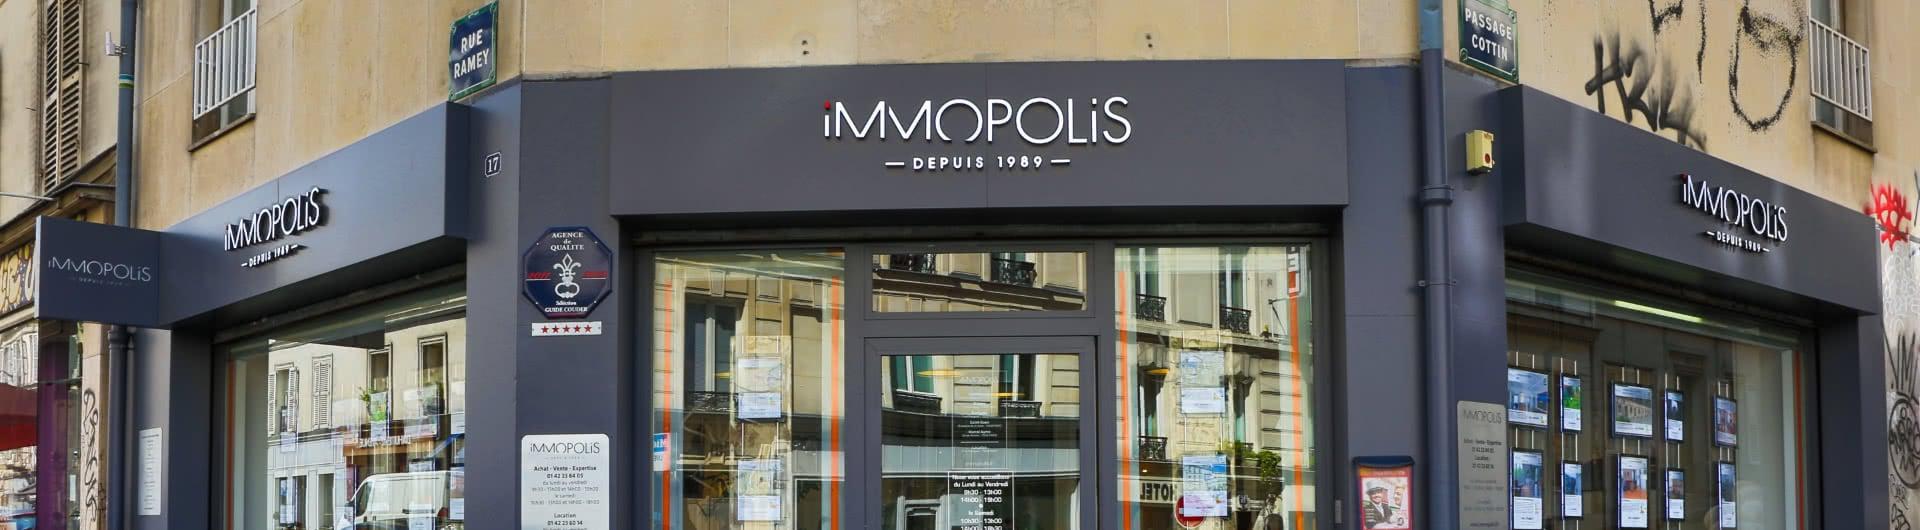 header-agence-immopolis-ramey